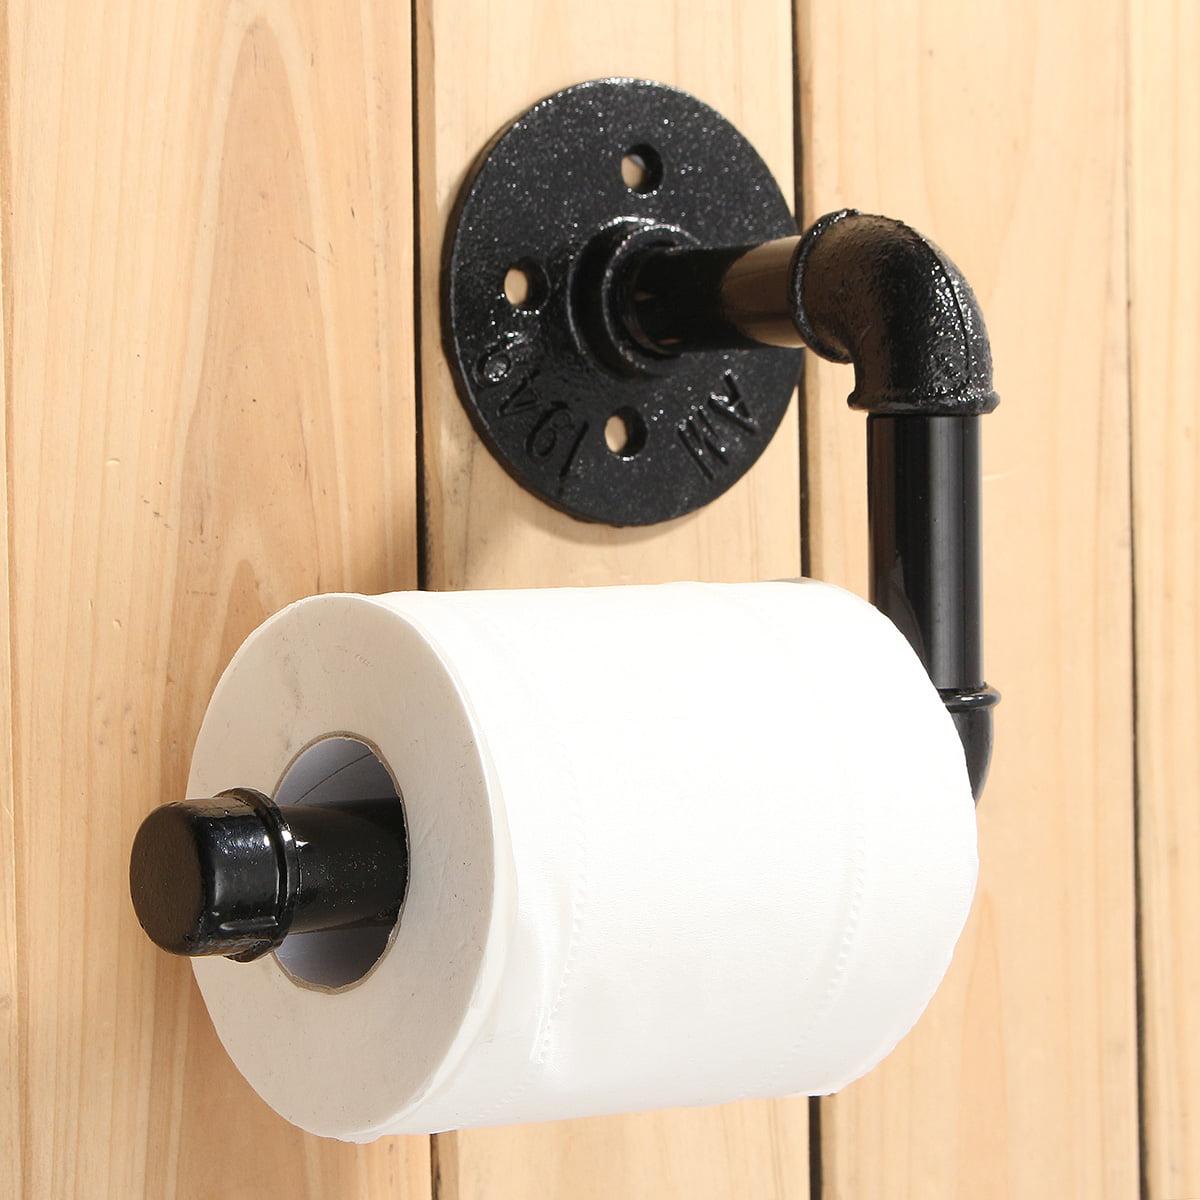 Diy Industrial Pipe Toilet Paper Tissue Holder Vintage Style Towel Racks With Hardware Wall Mount For Bathroom Bedroom Kitchen Black Walmart Com Walmart Com